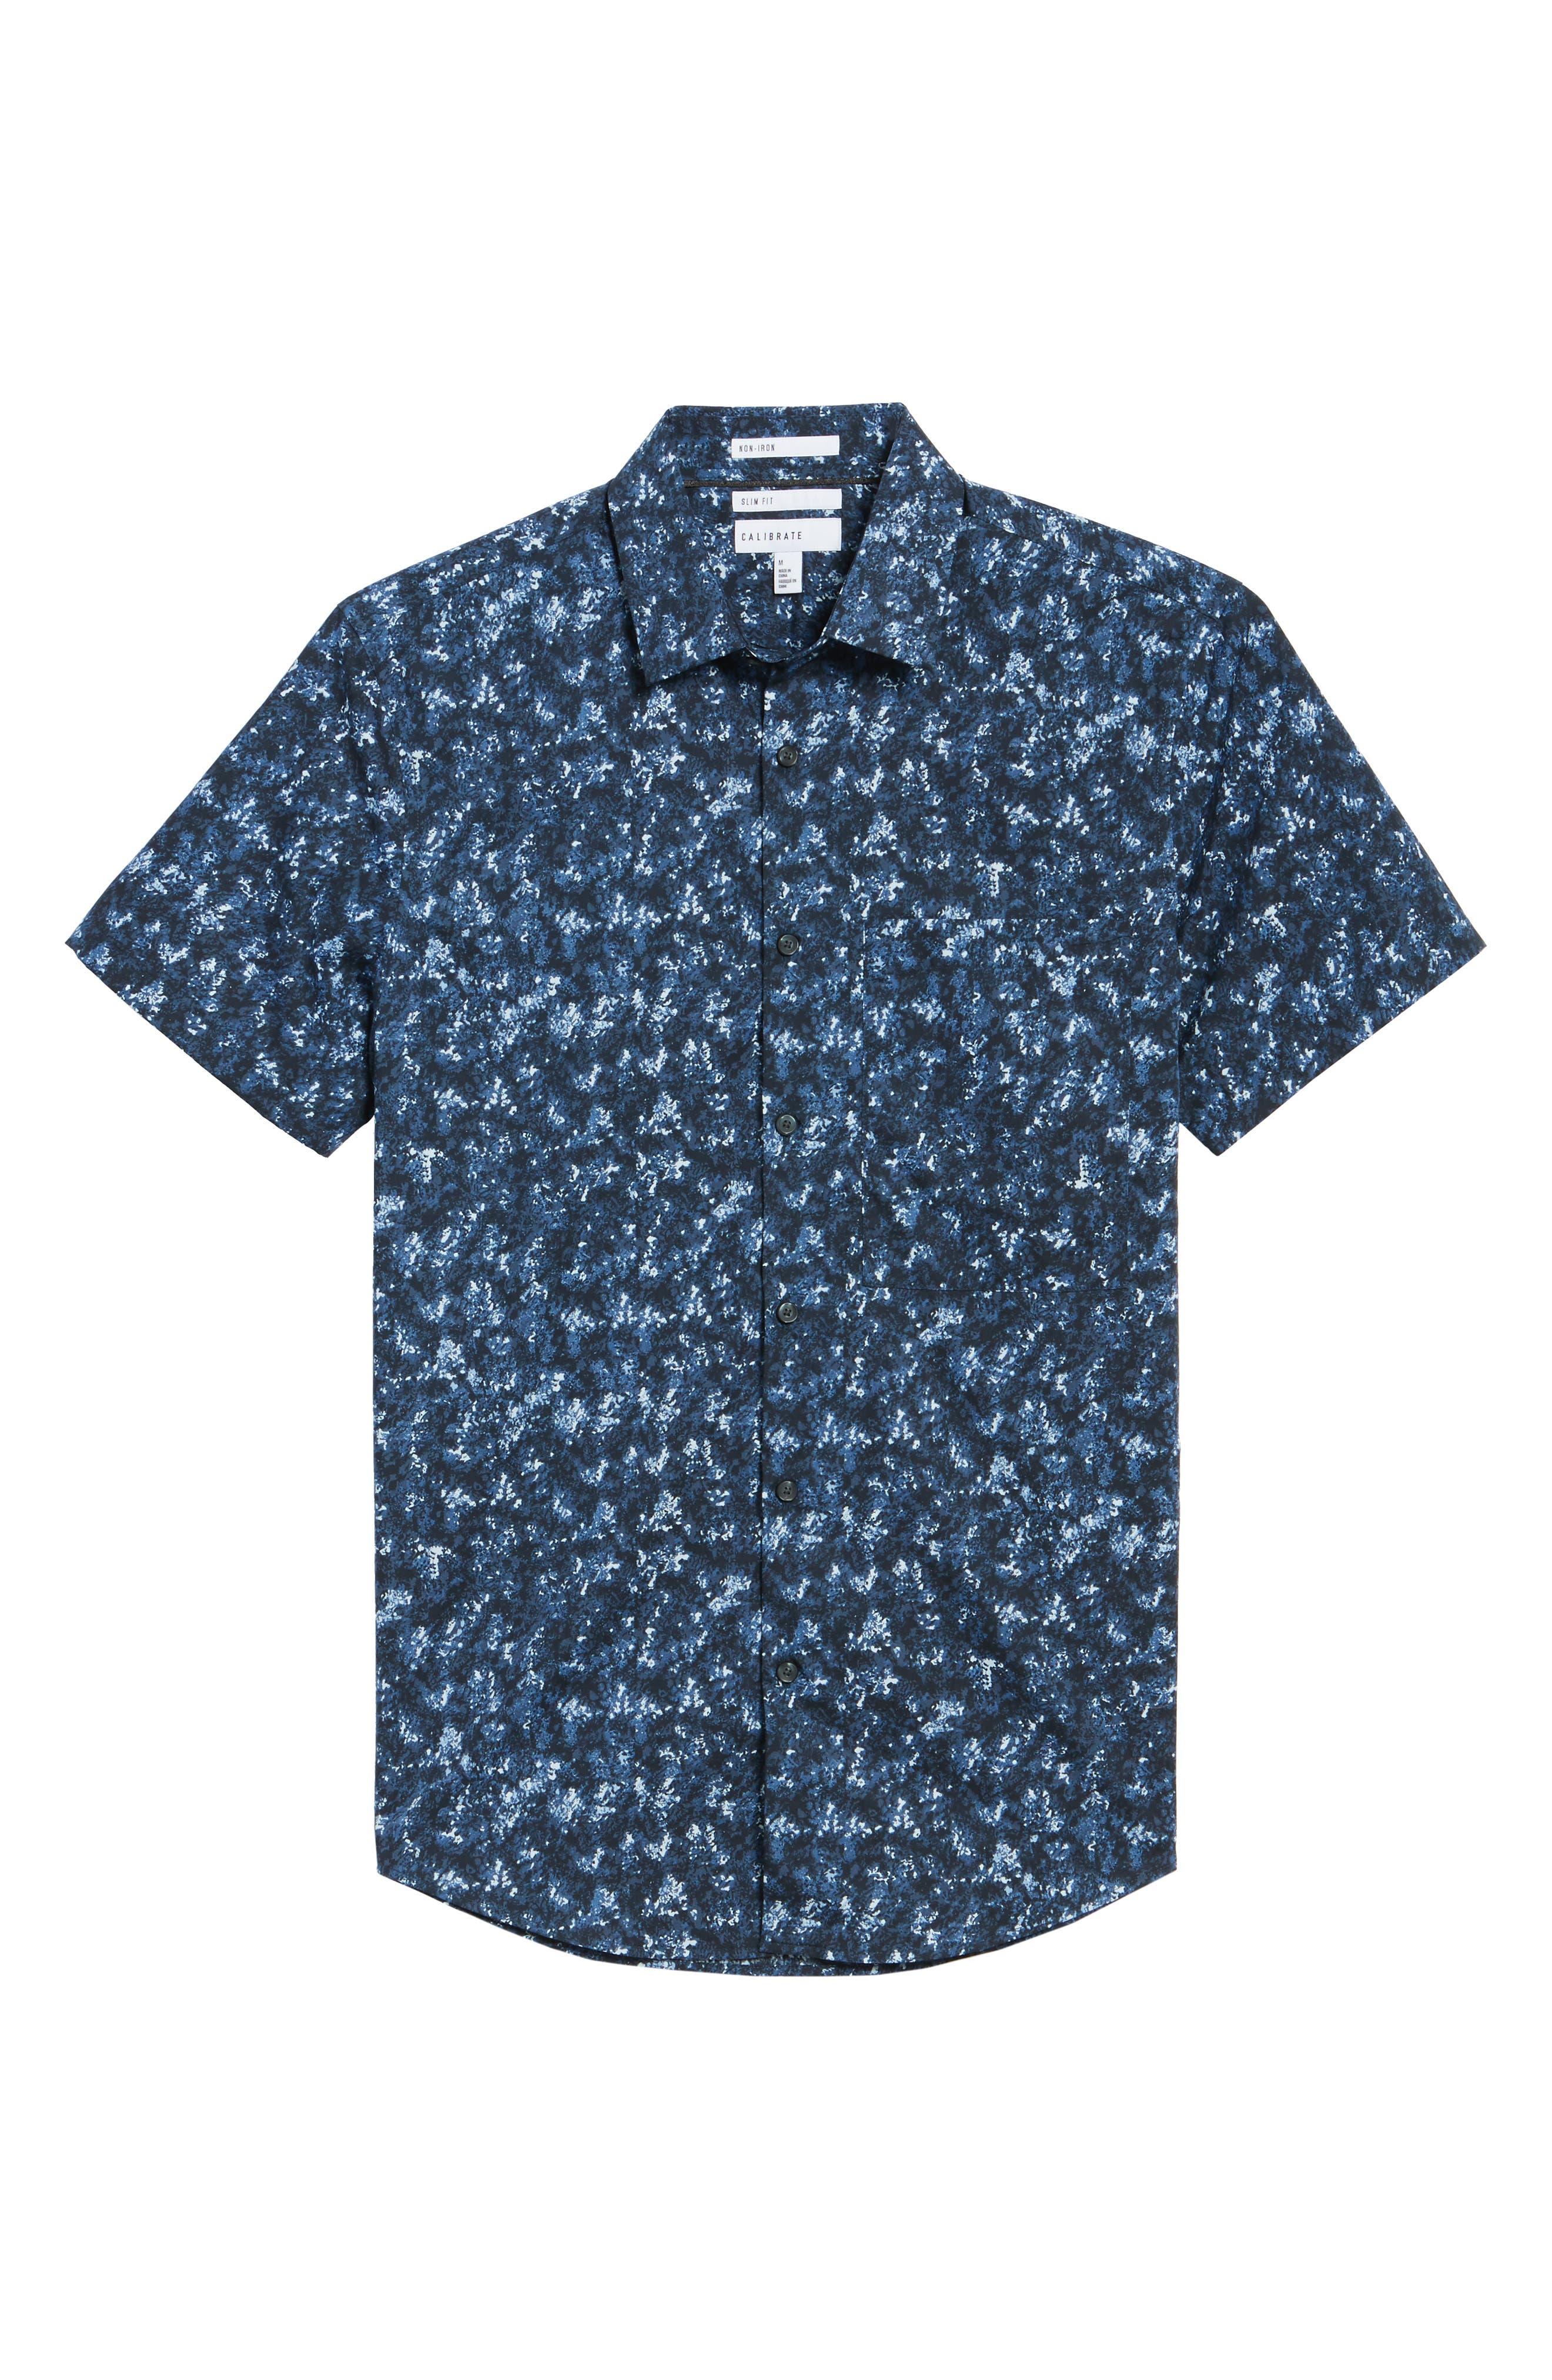 Print Sport Shirt,                             Alternate thumbnail 6, color,                             Blue Navy Crinkle